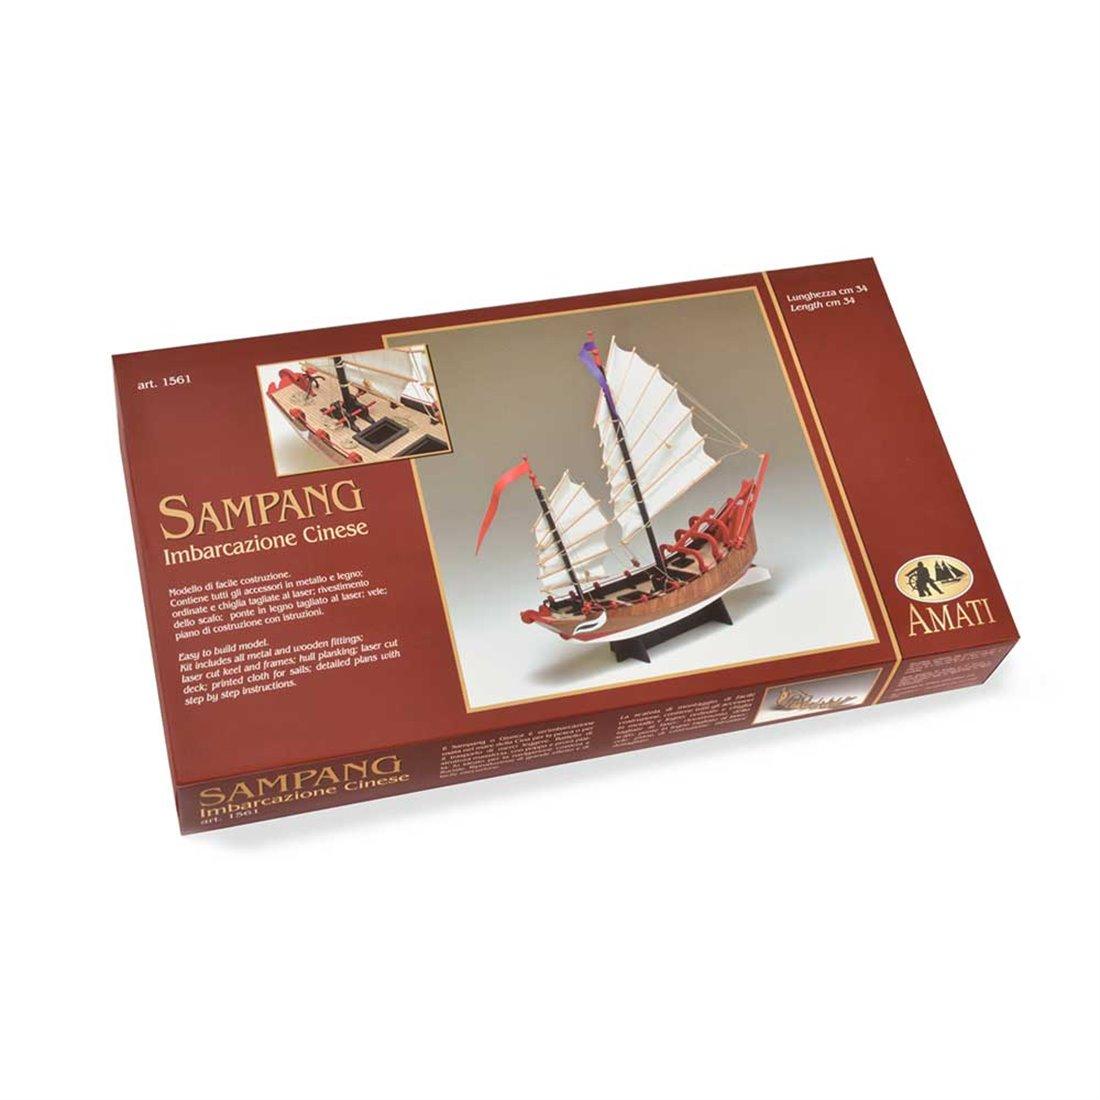 Scatola montaggio Sampang